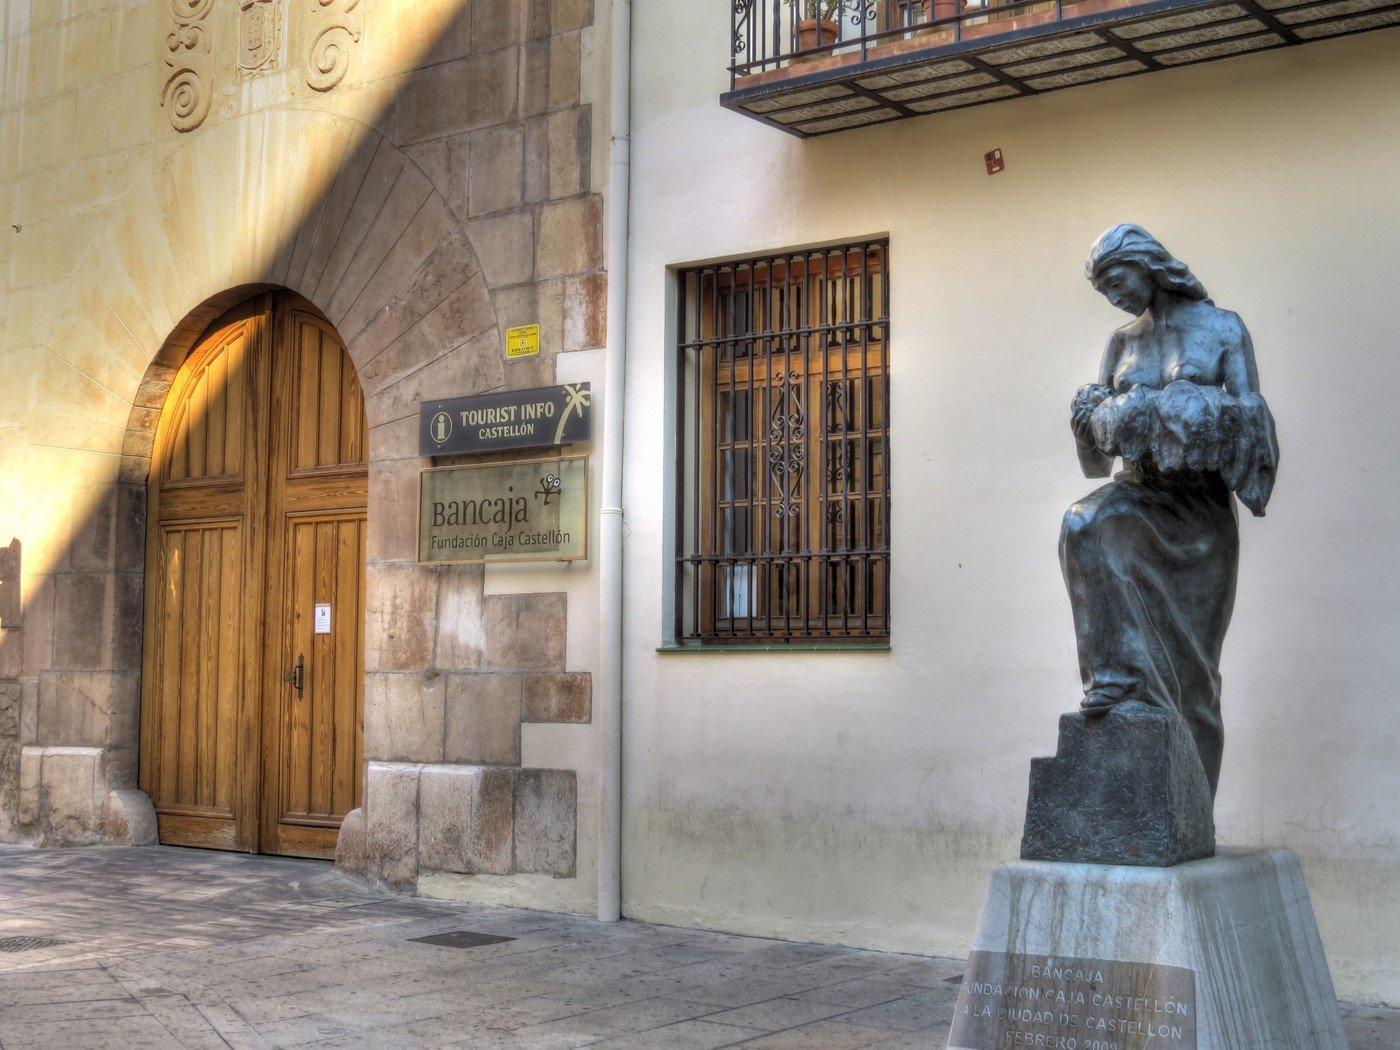 Oficina de turismo castell n de la plana for Oficina turismo castellon